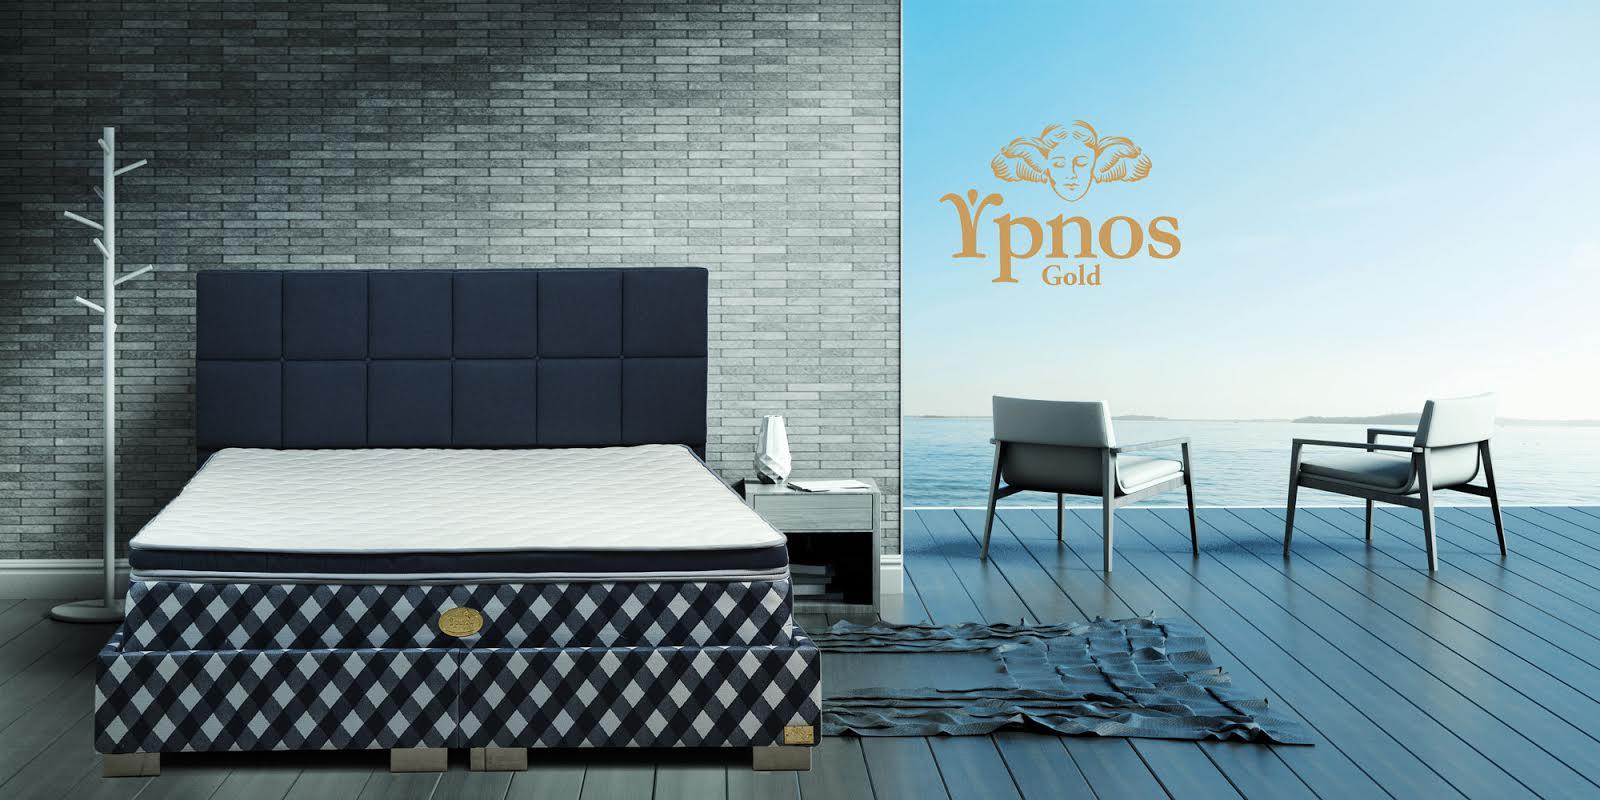 Ypnos Gold Bedroom